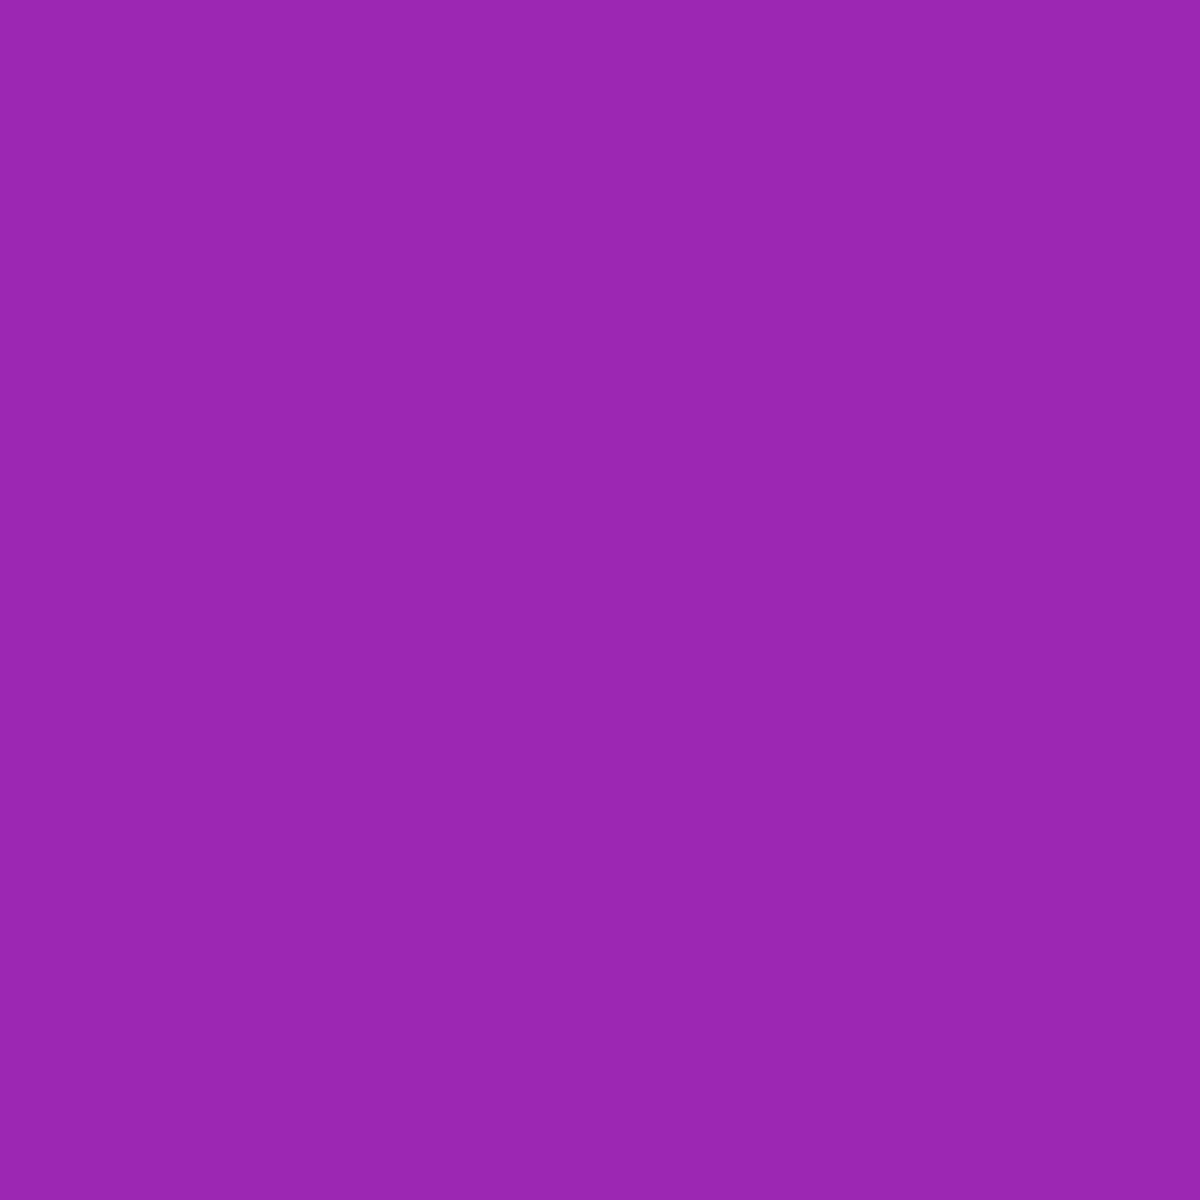 purple by MY-PRATA